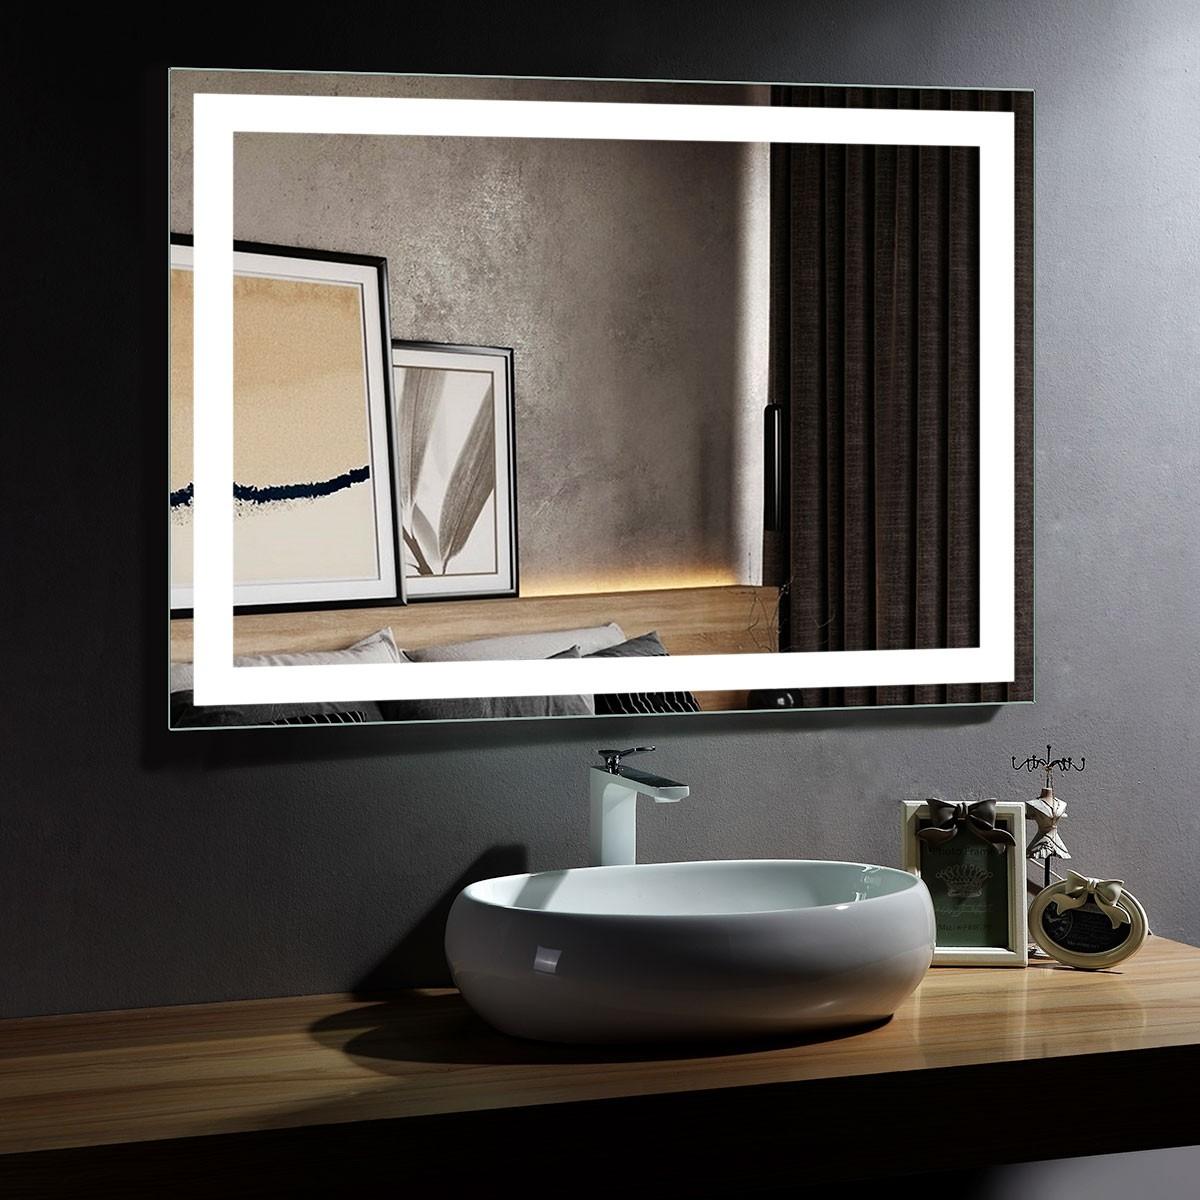 DECORAPORT 48 x 36 Inch LED Bathroom Mirror/Dress Mirror with Infrared Sensor Control, Anti-Fog, Vertical & Horizontal Mount (CK010-4836-GS)